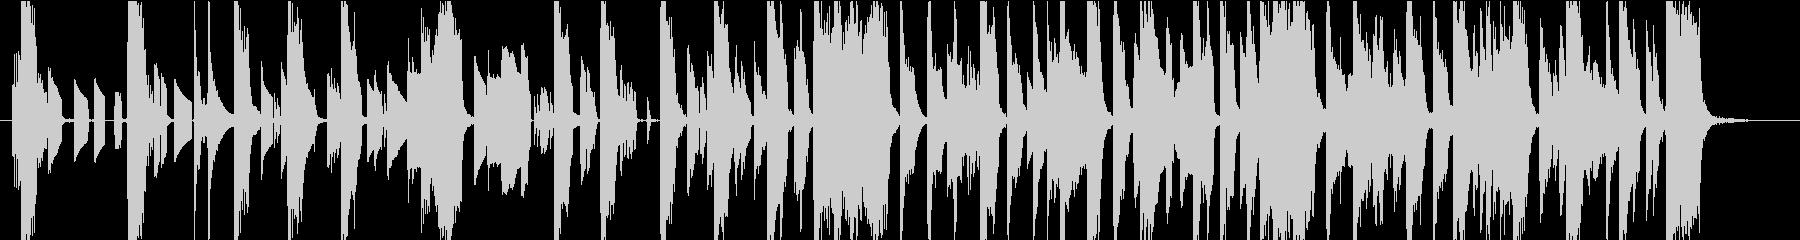 POPな電子音・可愛いジングル_2の未再生の波形